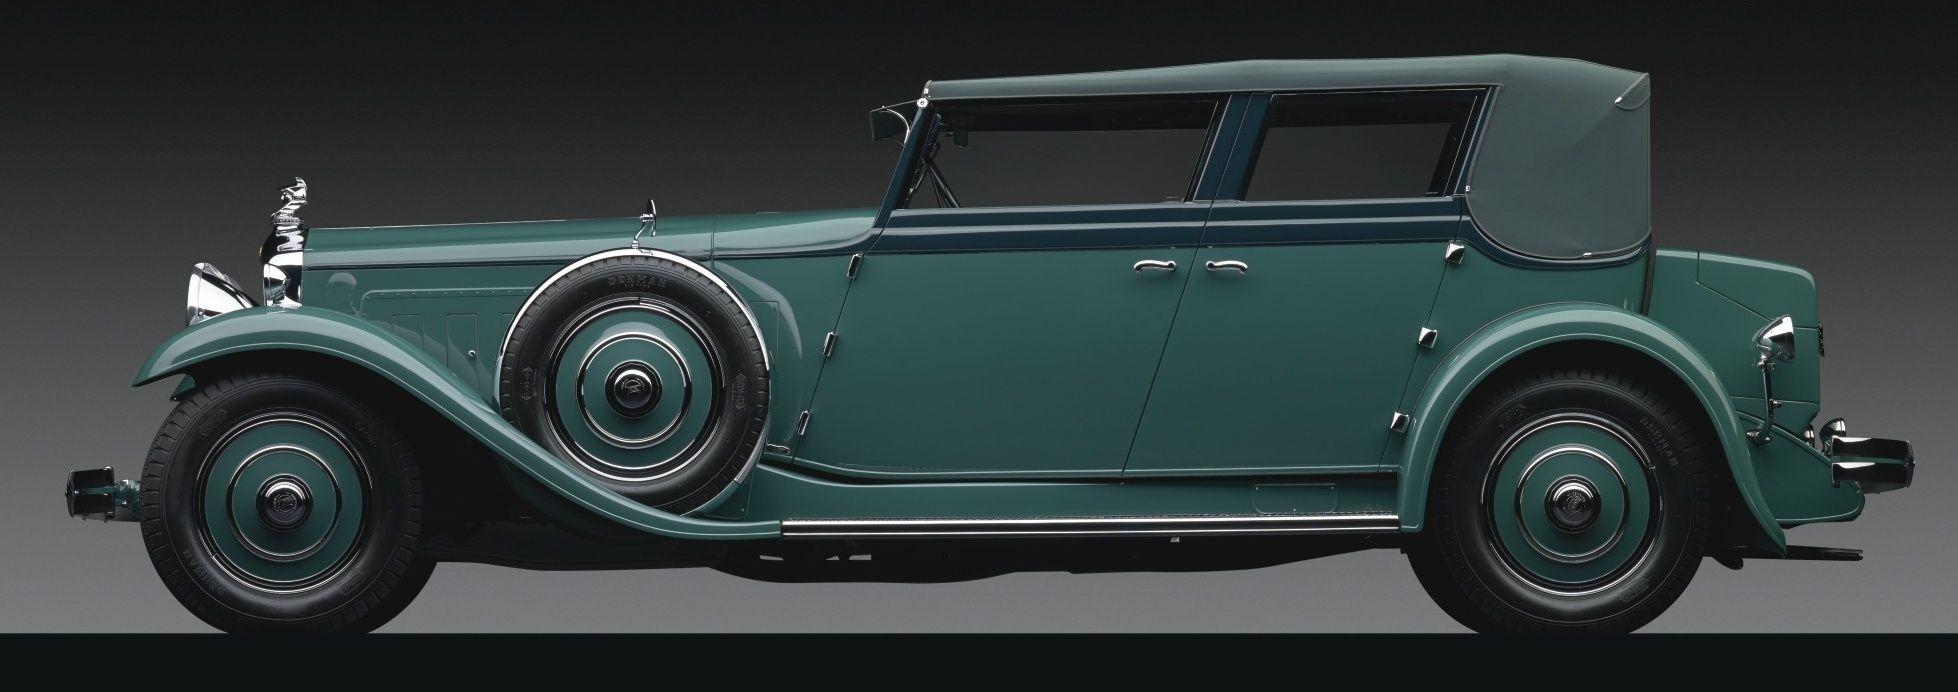 1931 Minerva 8 AL Convertible Sedan Super cars, Classy